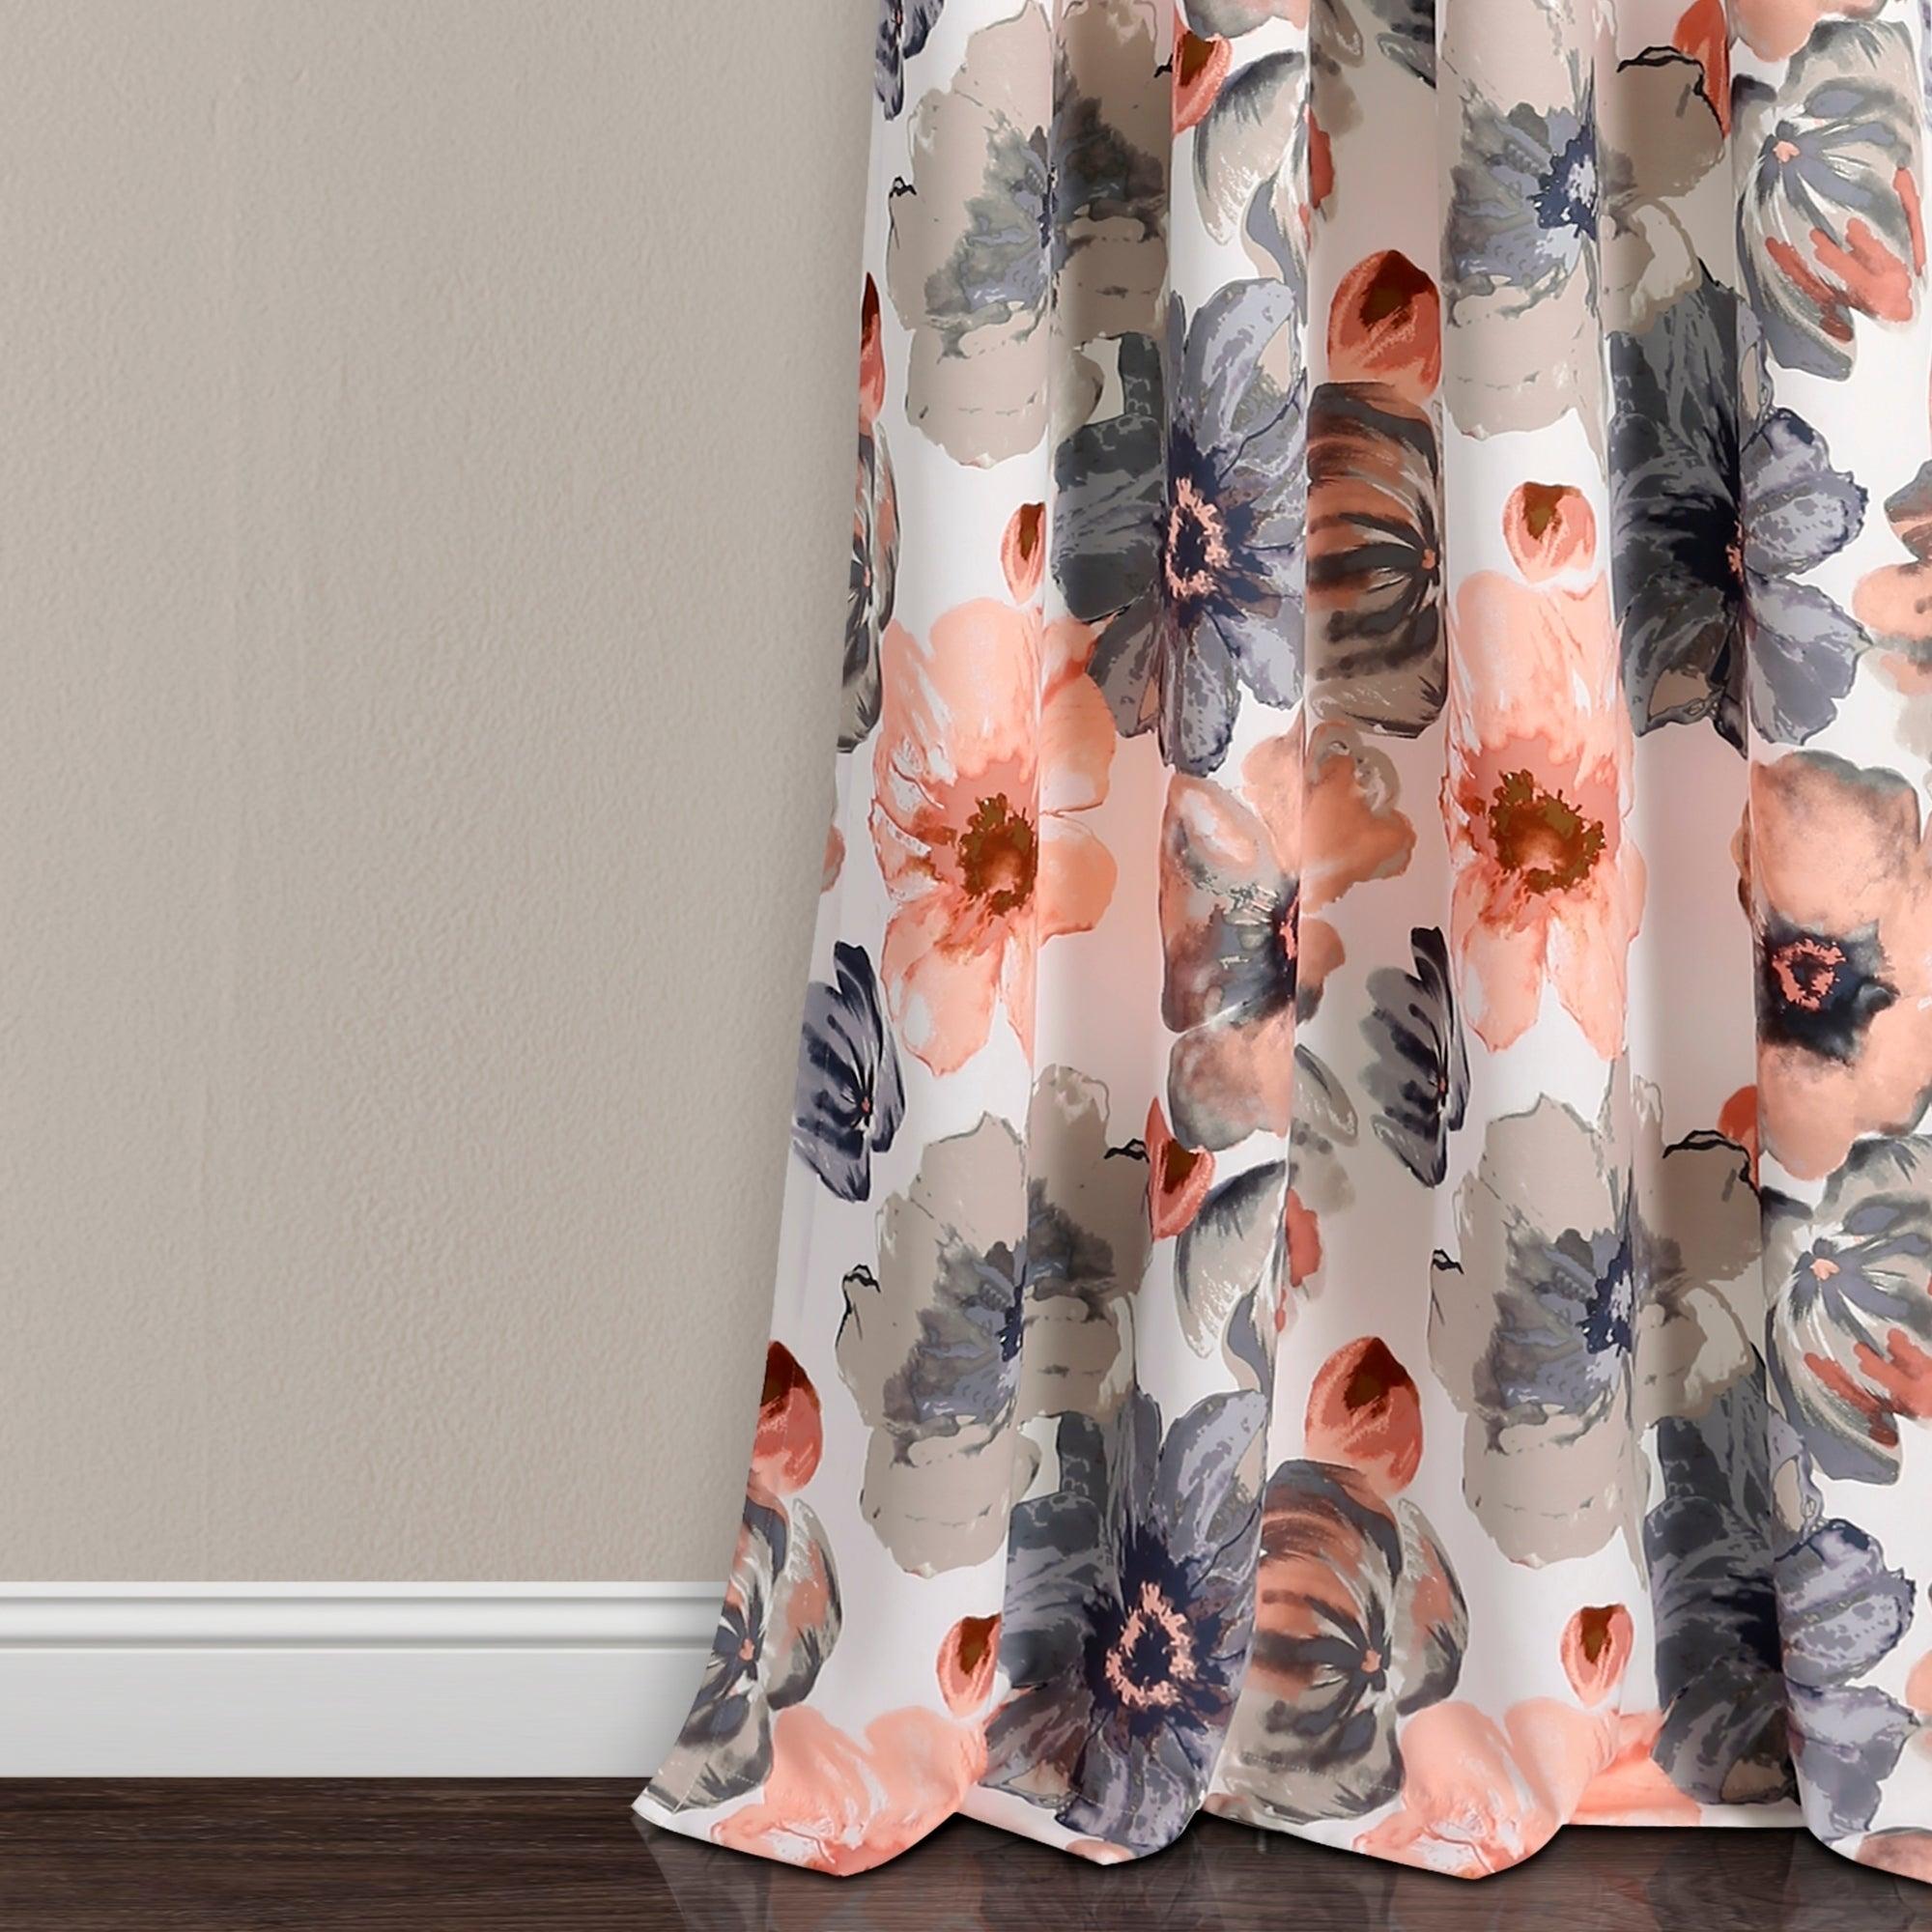 Lush Decor Leah Room Darkening Curtain Panel Pair Within Leah Room Darkening Curtain Panel Pairs (View 16 of 20)